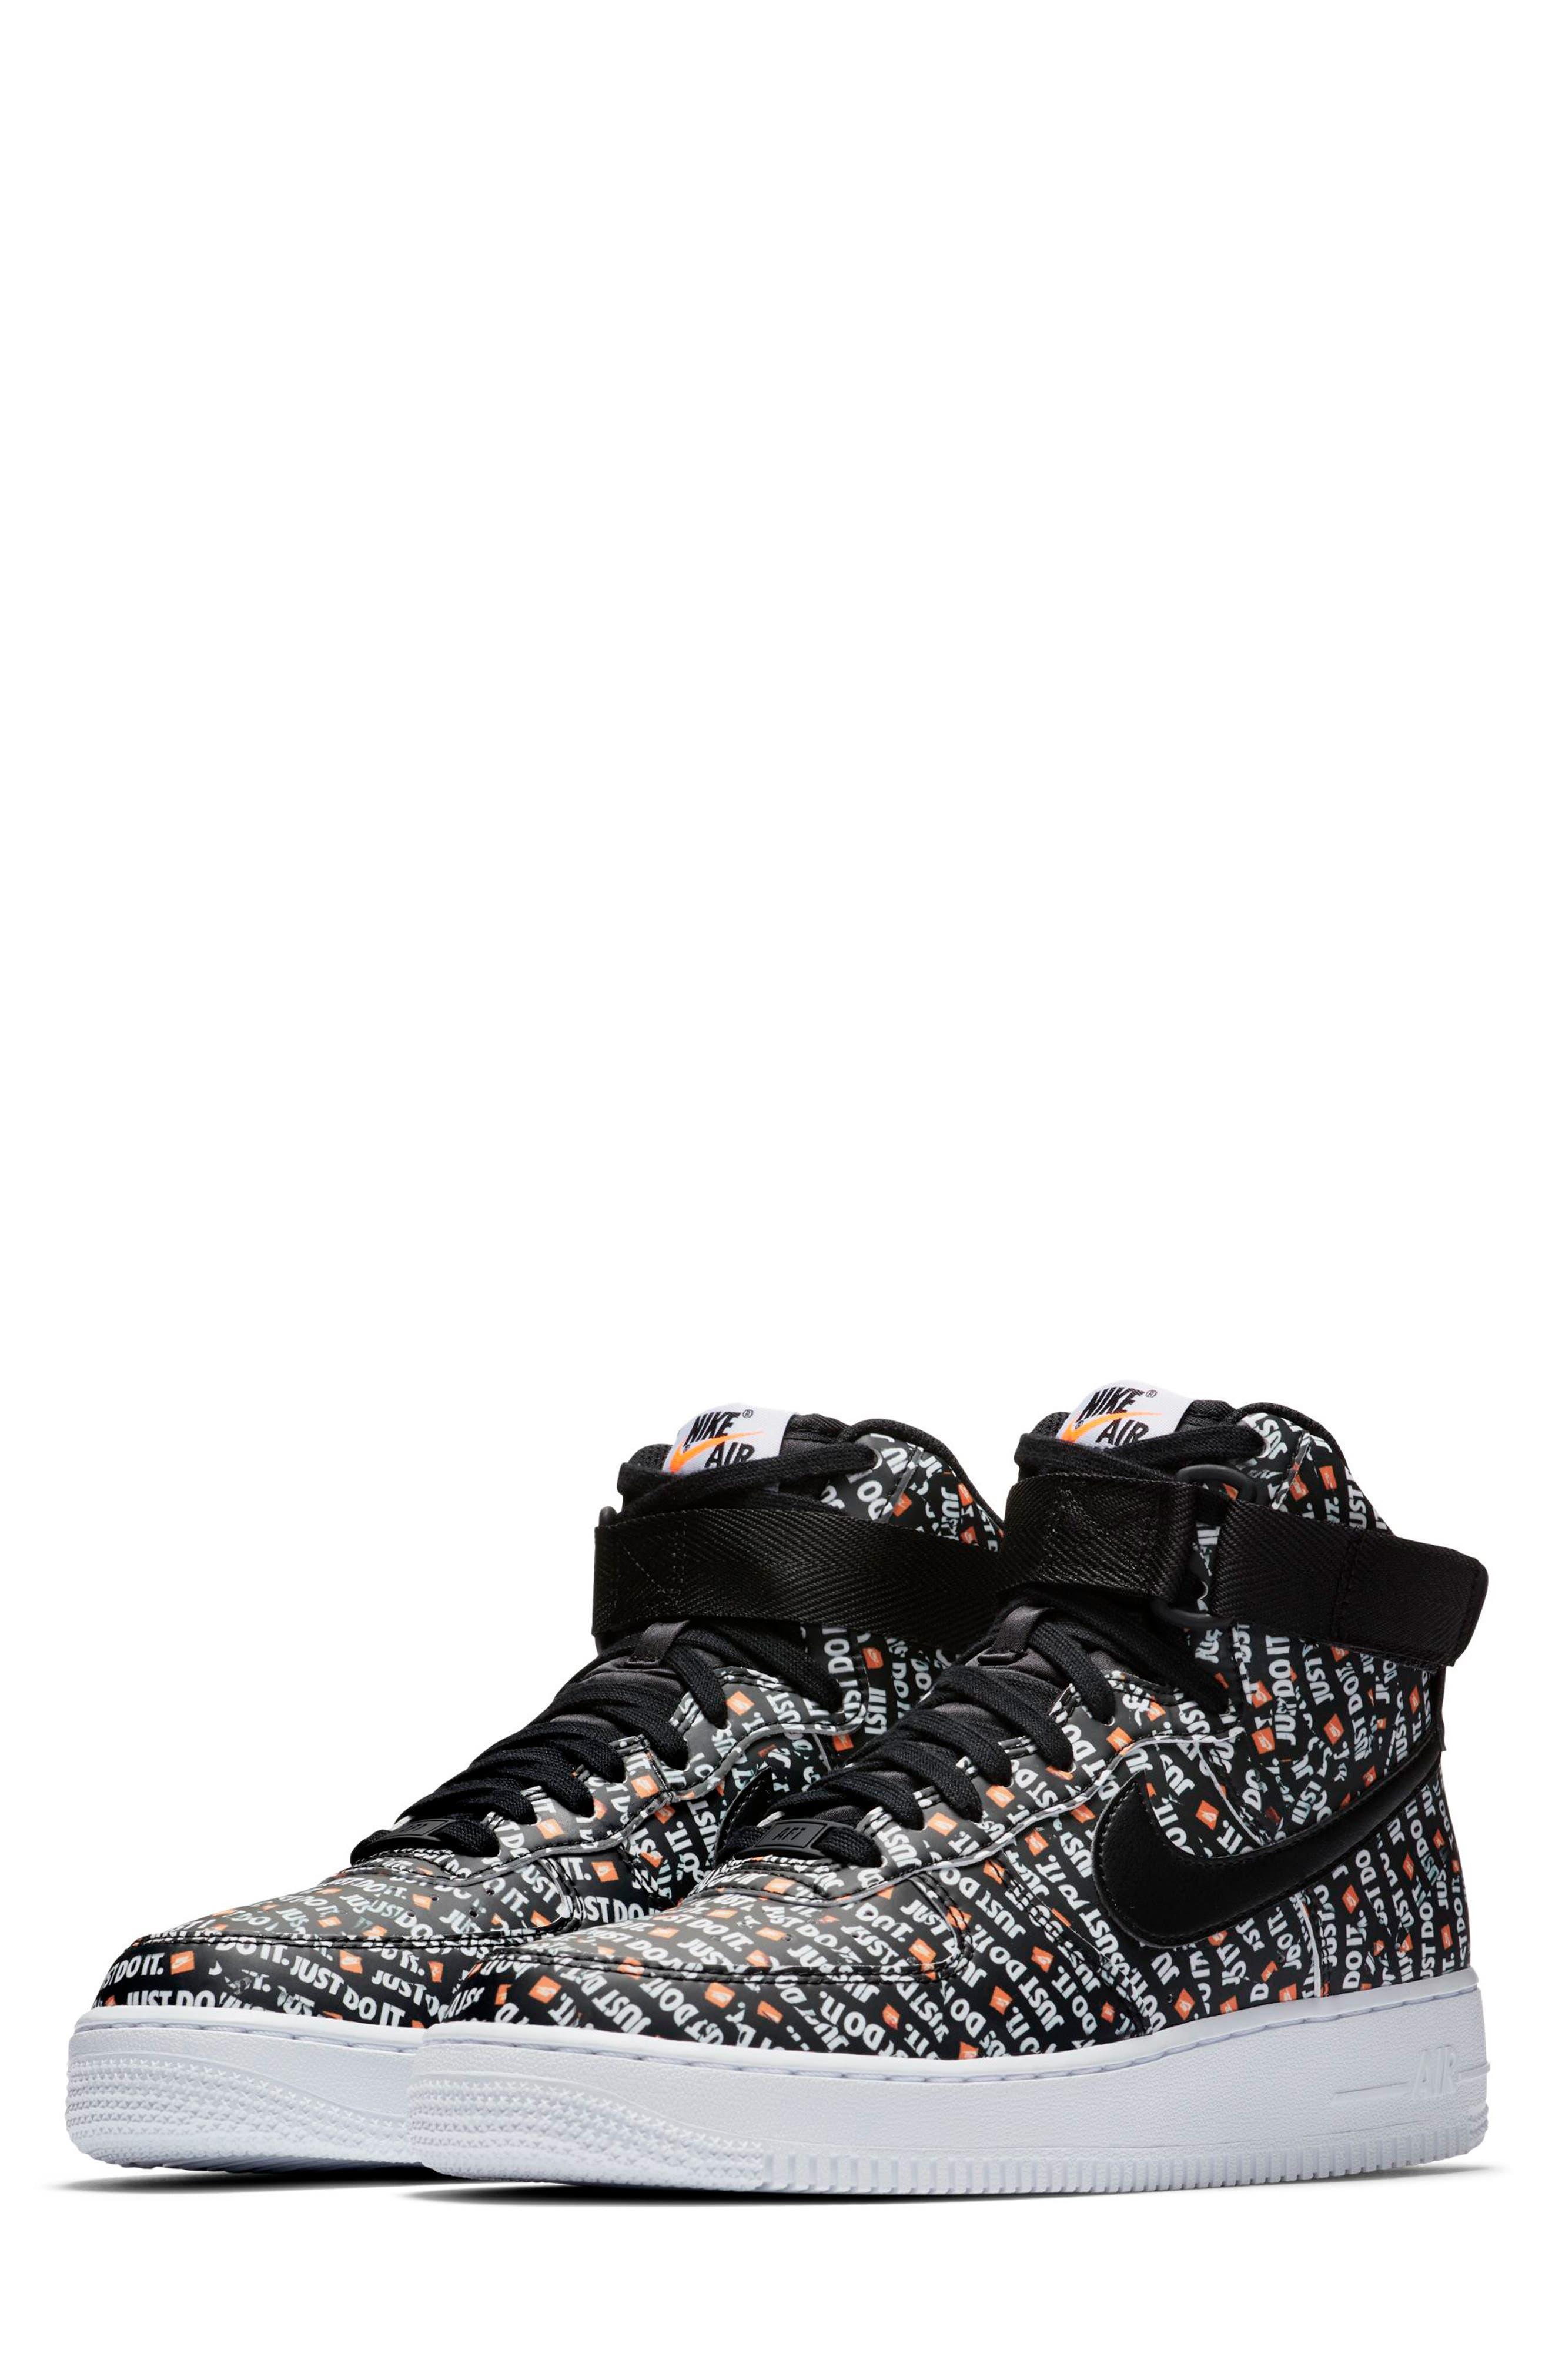 Air Force 1 High LX High Top Sneaker,                         Main,                         color, BLACK